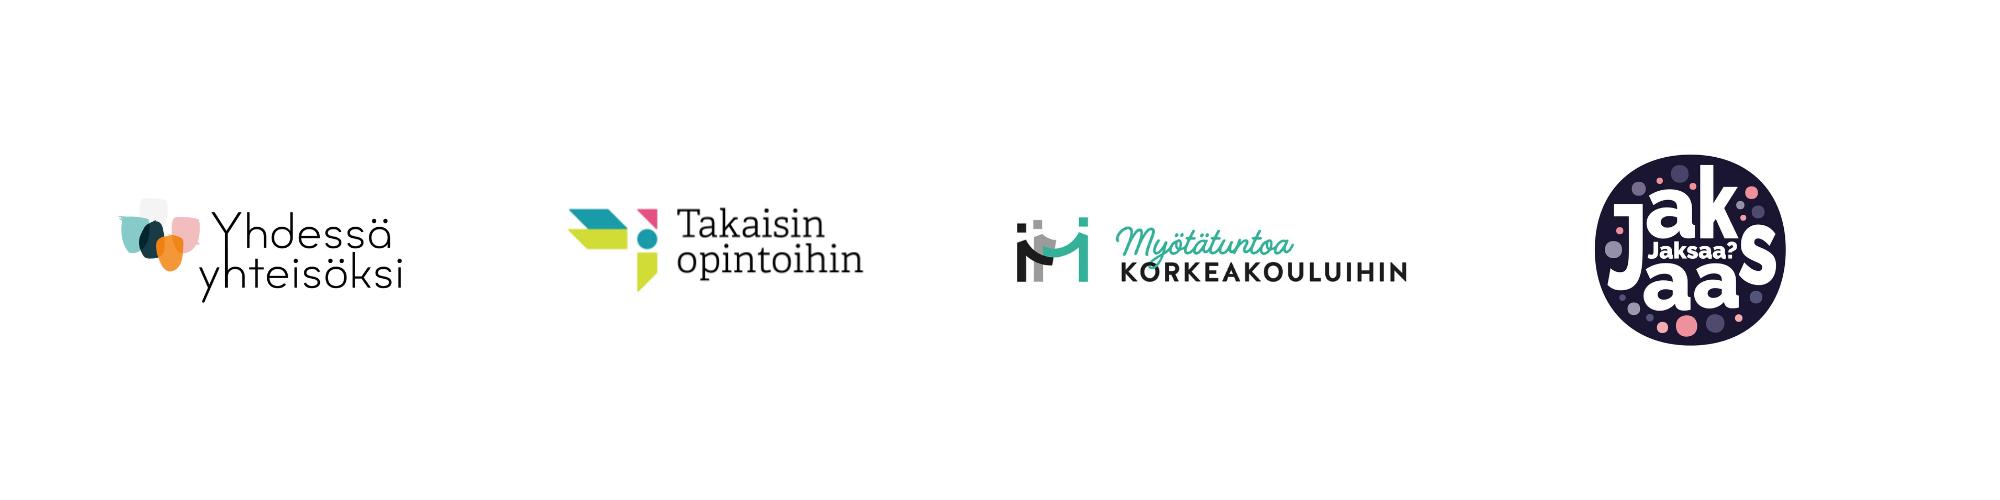 Hankkeiden logot